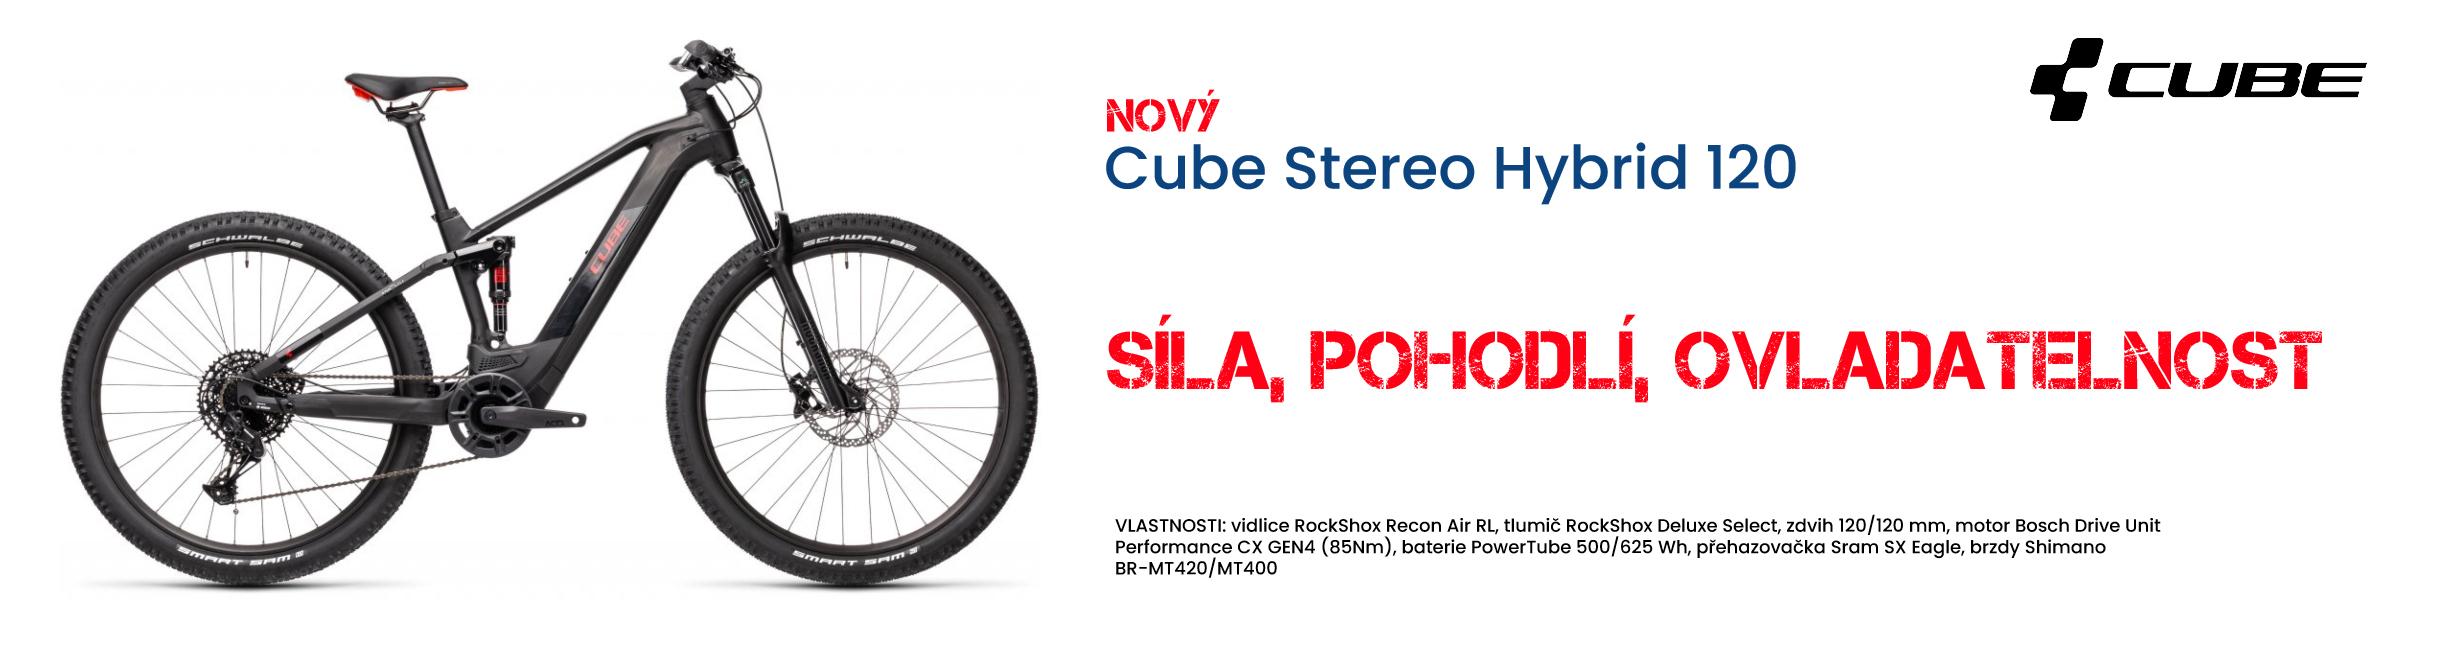 cube stereo hybrid 2021